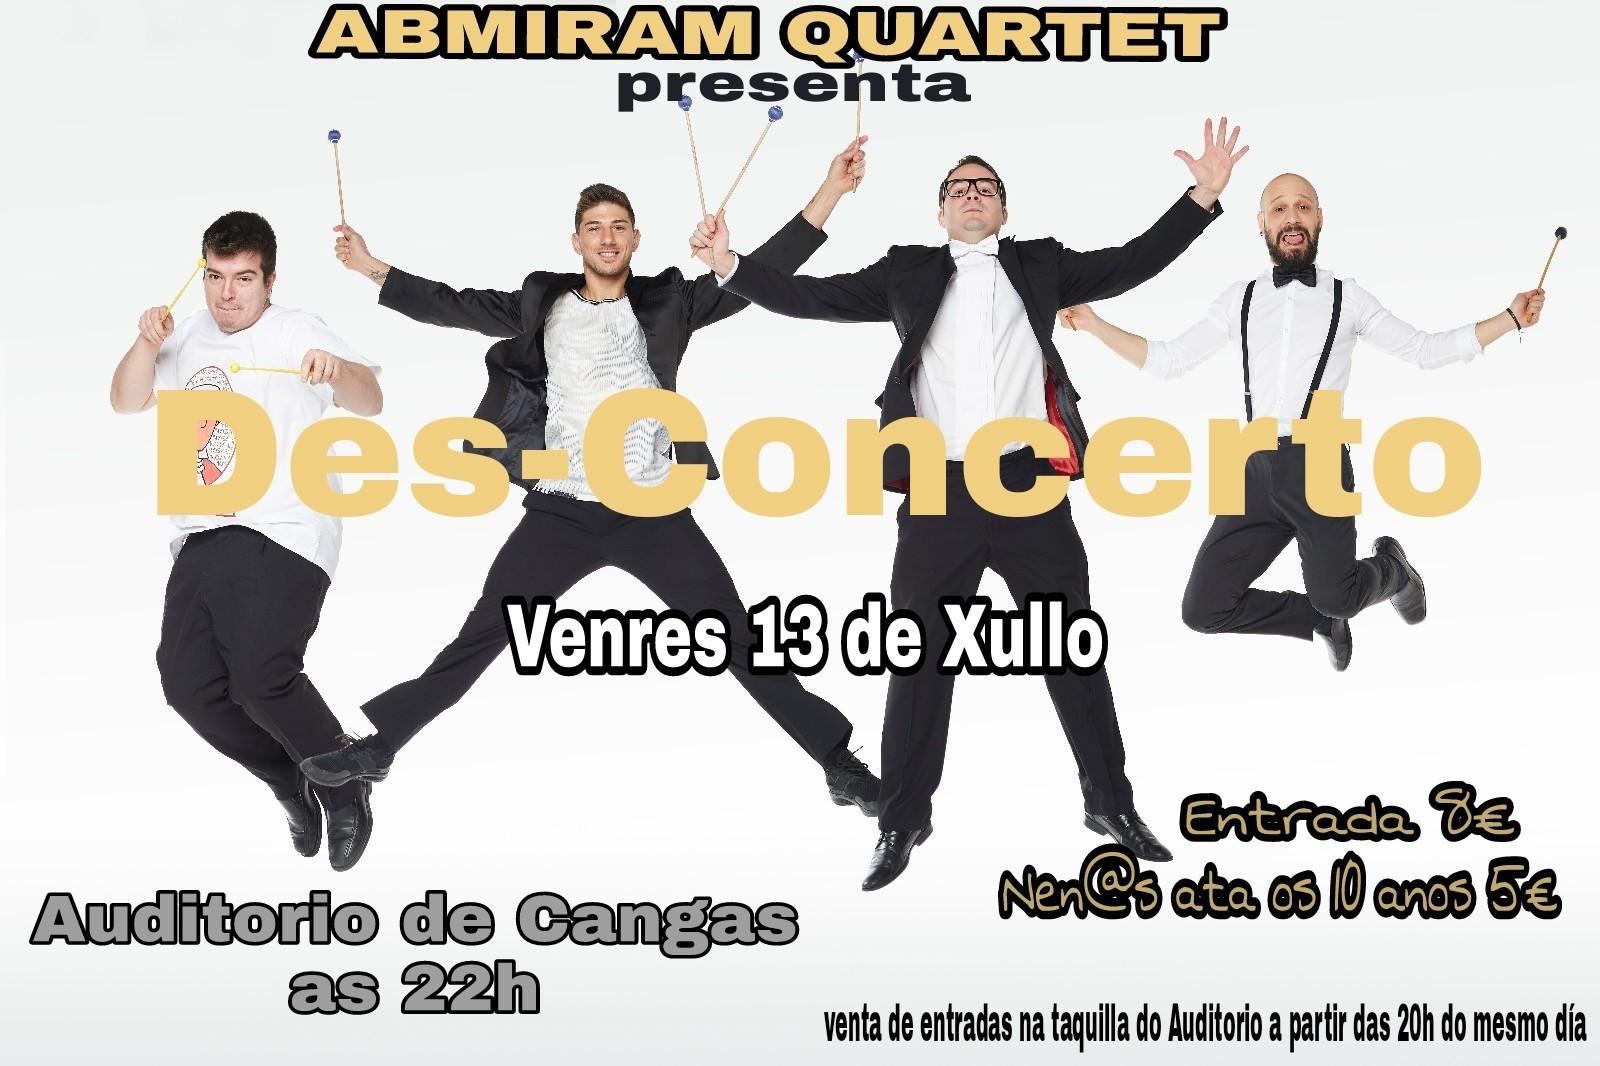 Des Concerto Abmiram Quartet